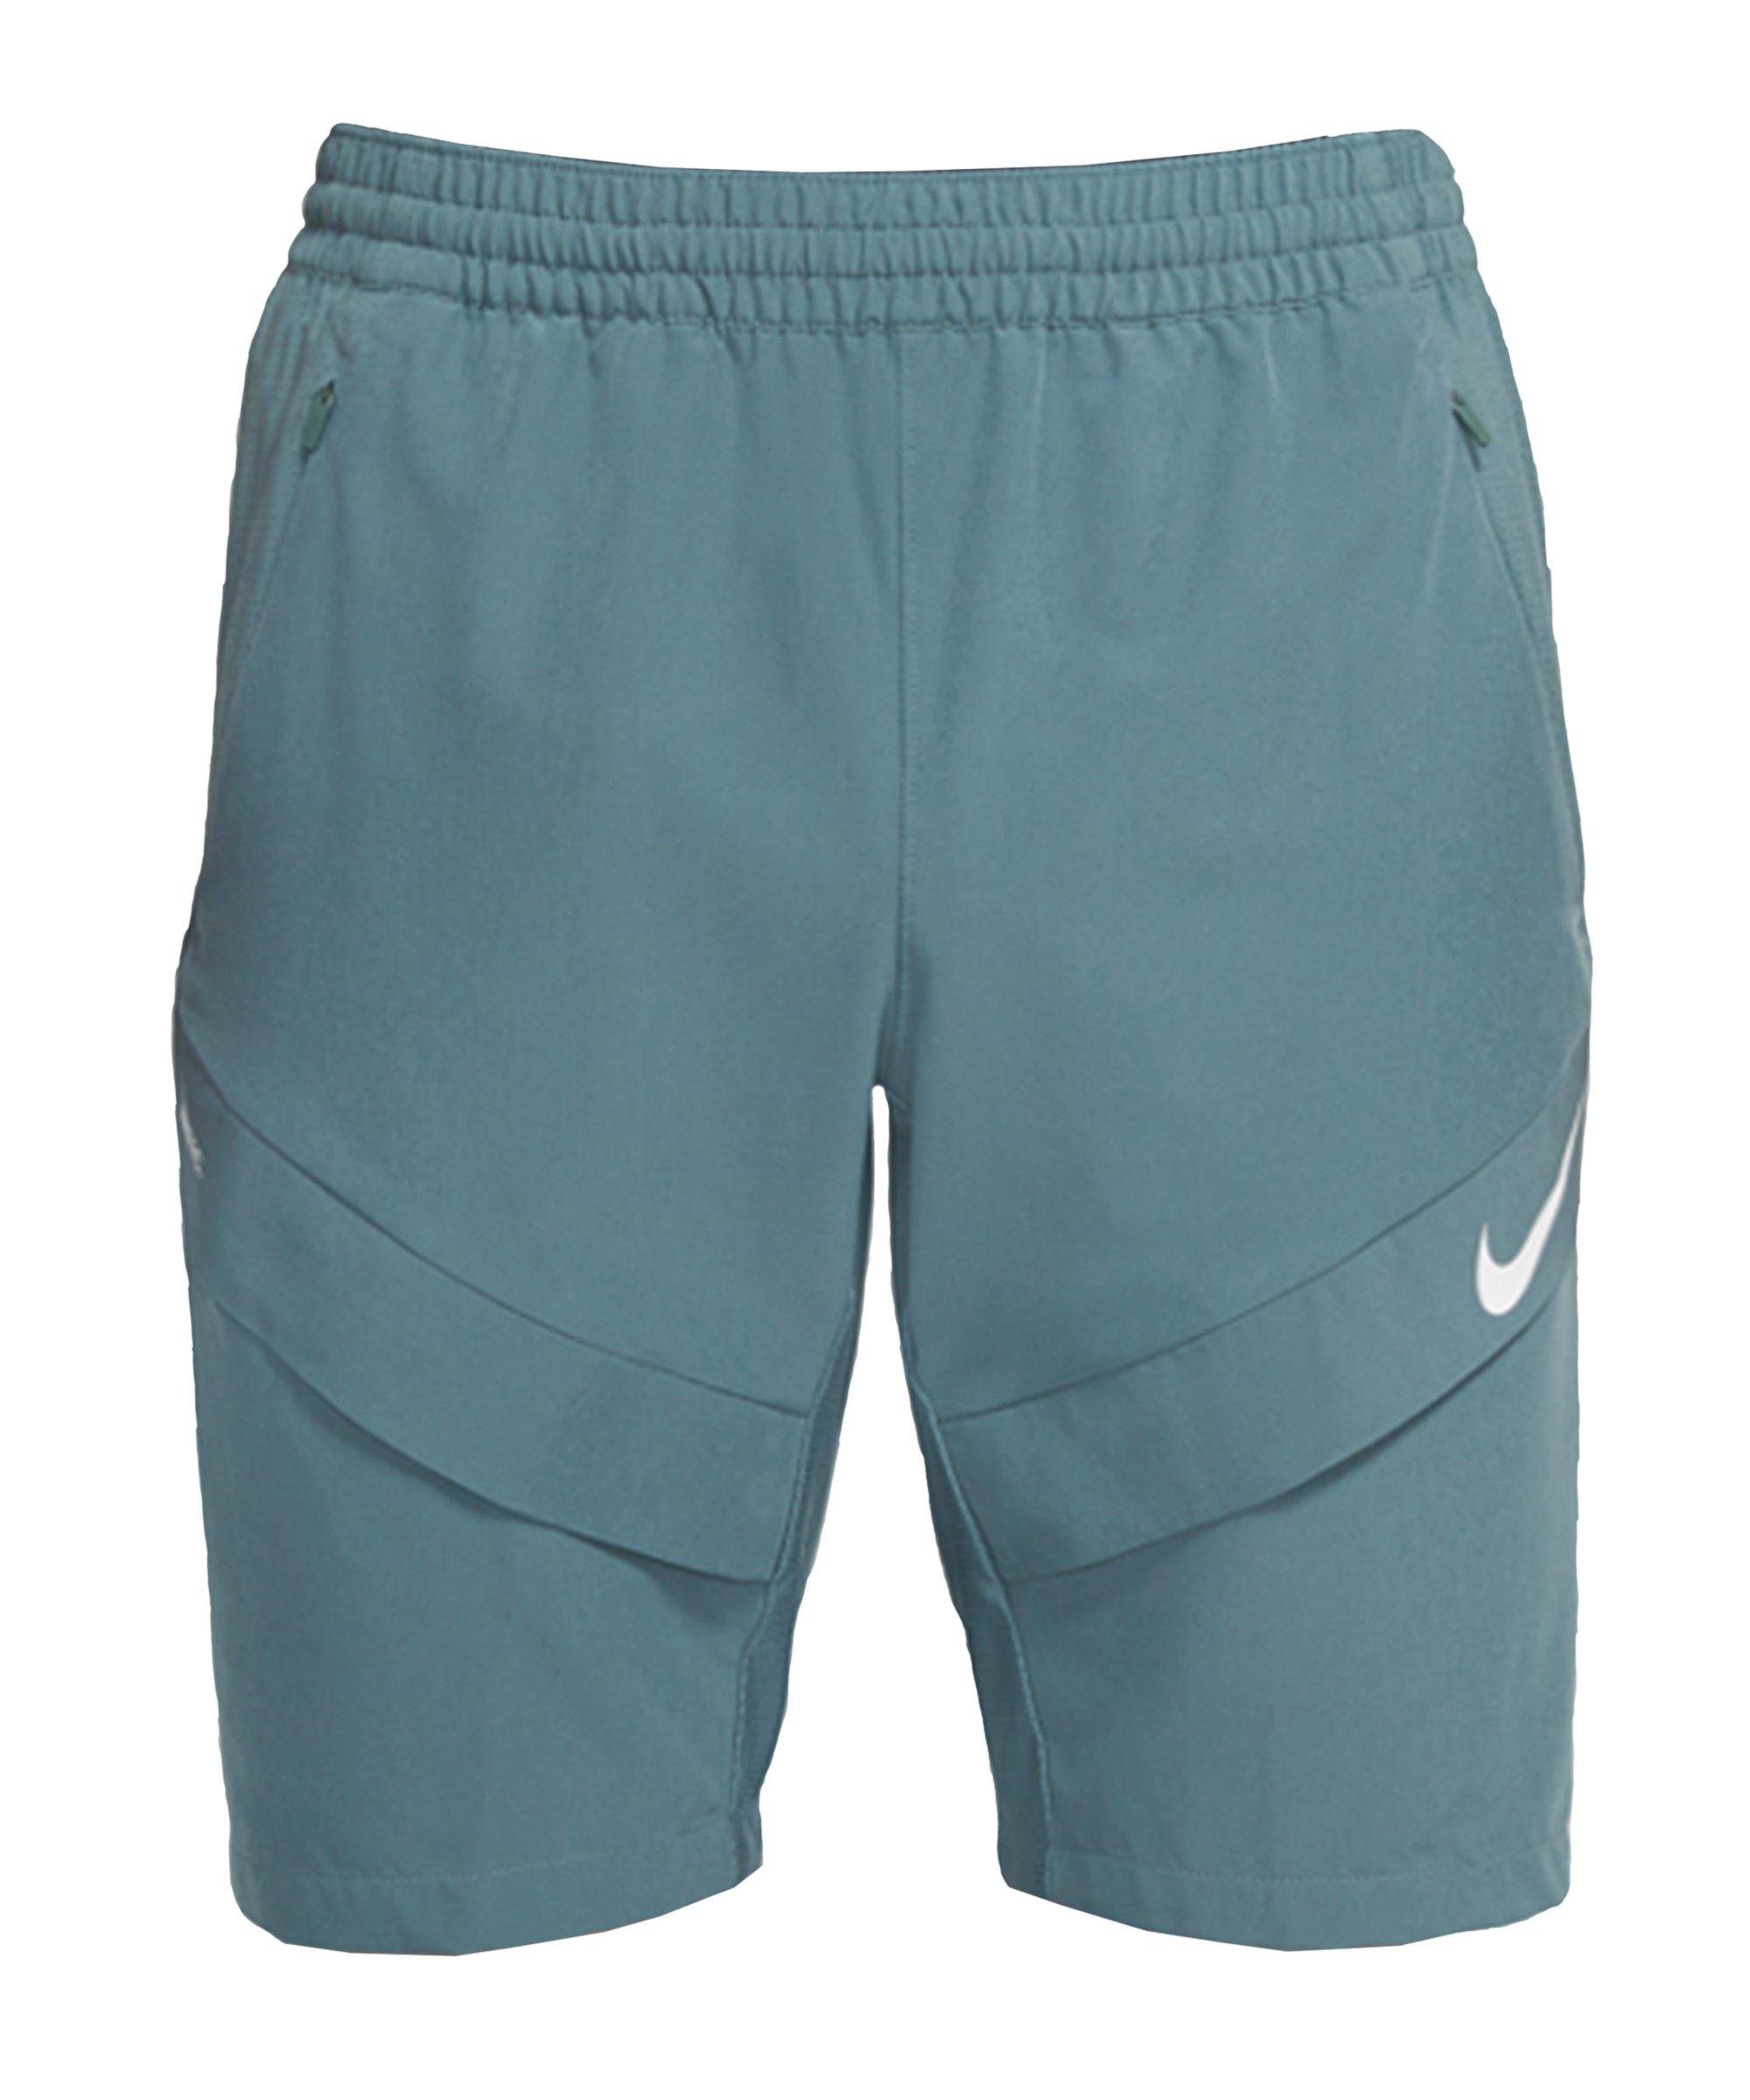 Nike F.C. Elite M18 Woven Short Grau Weiss F387 - gruen